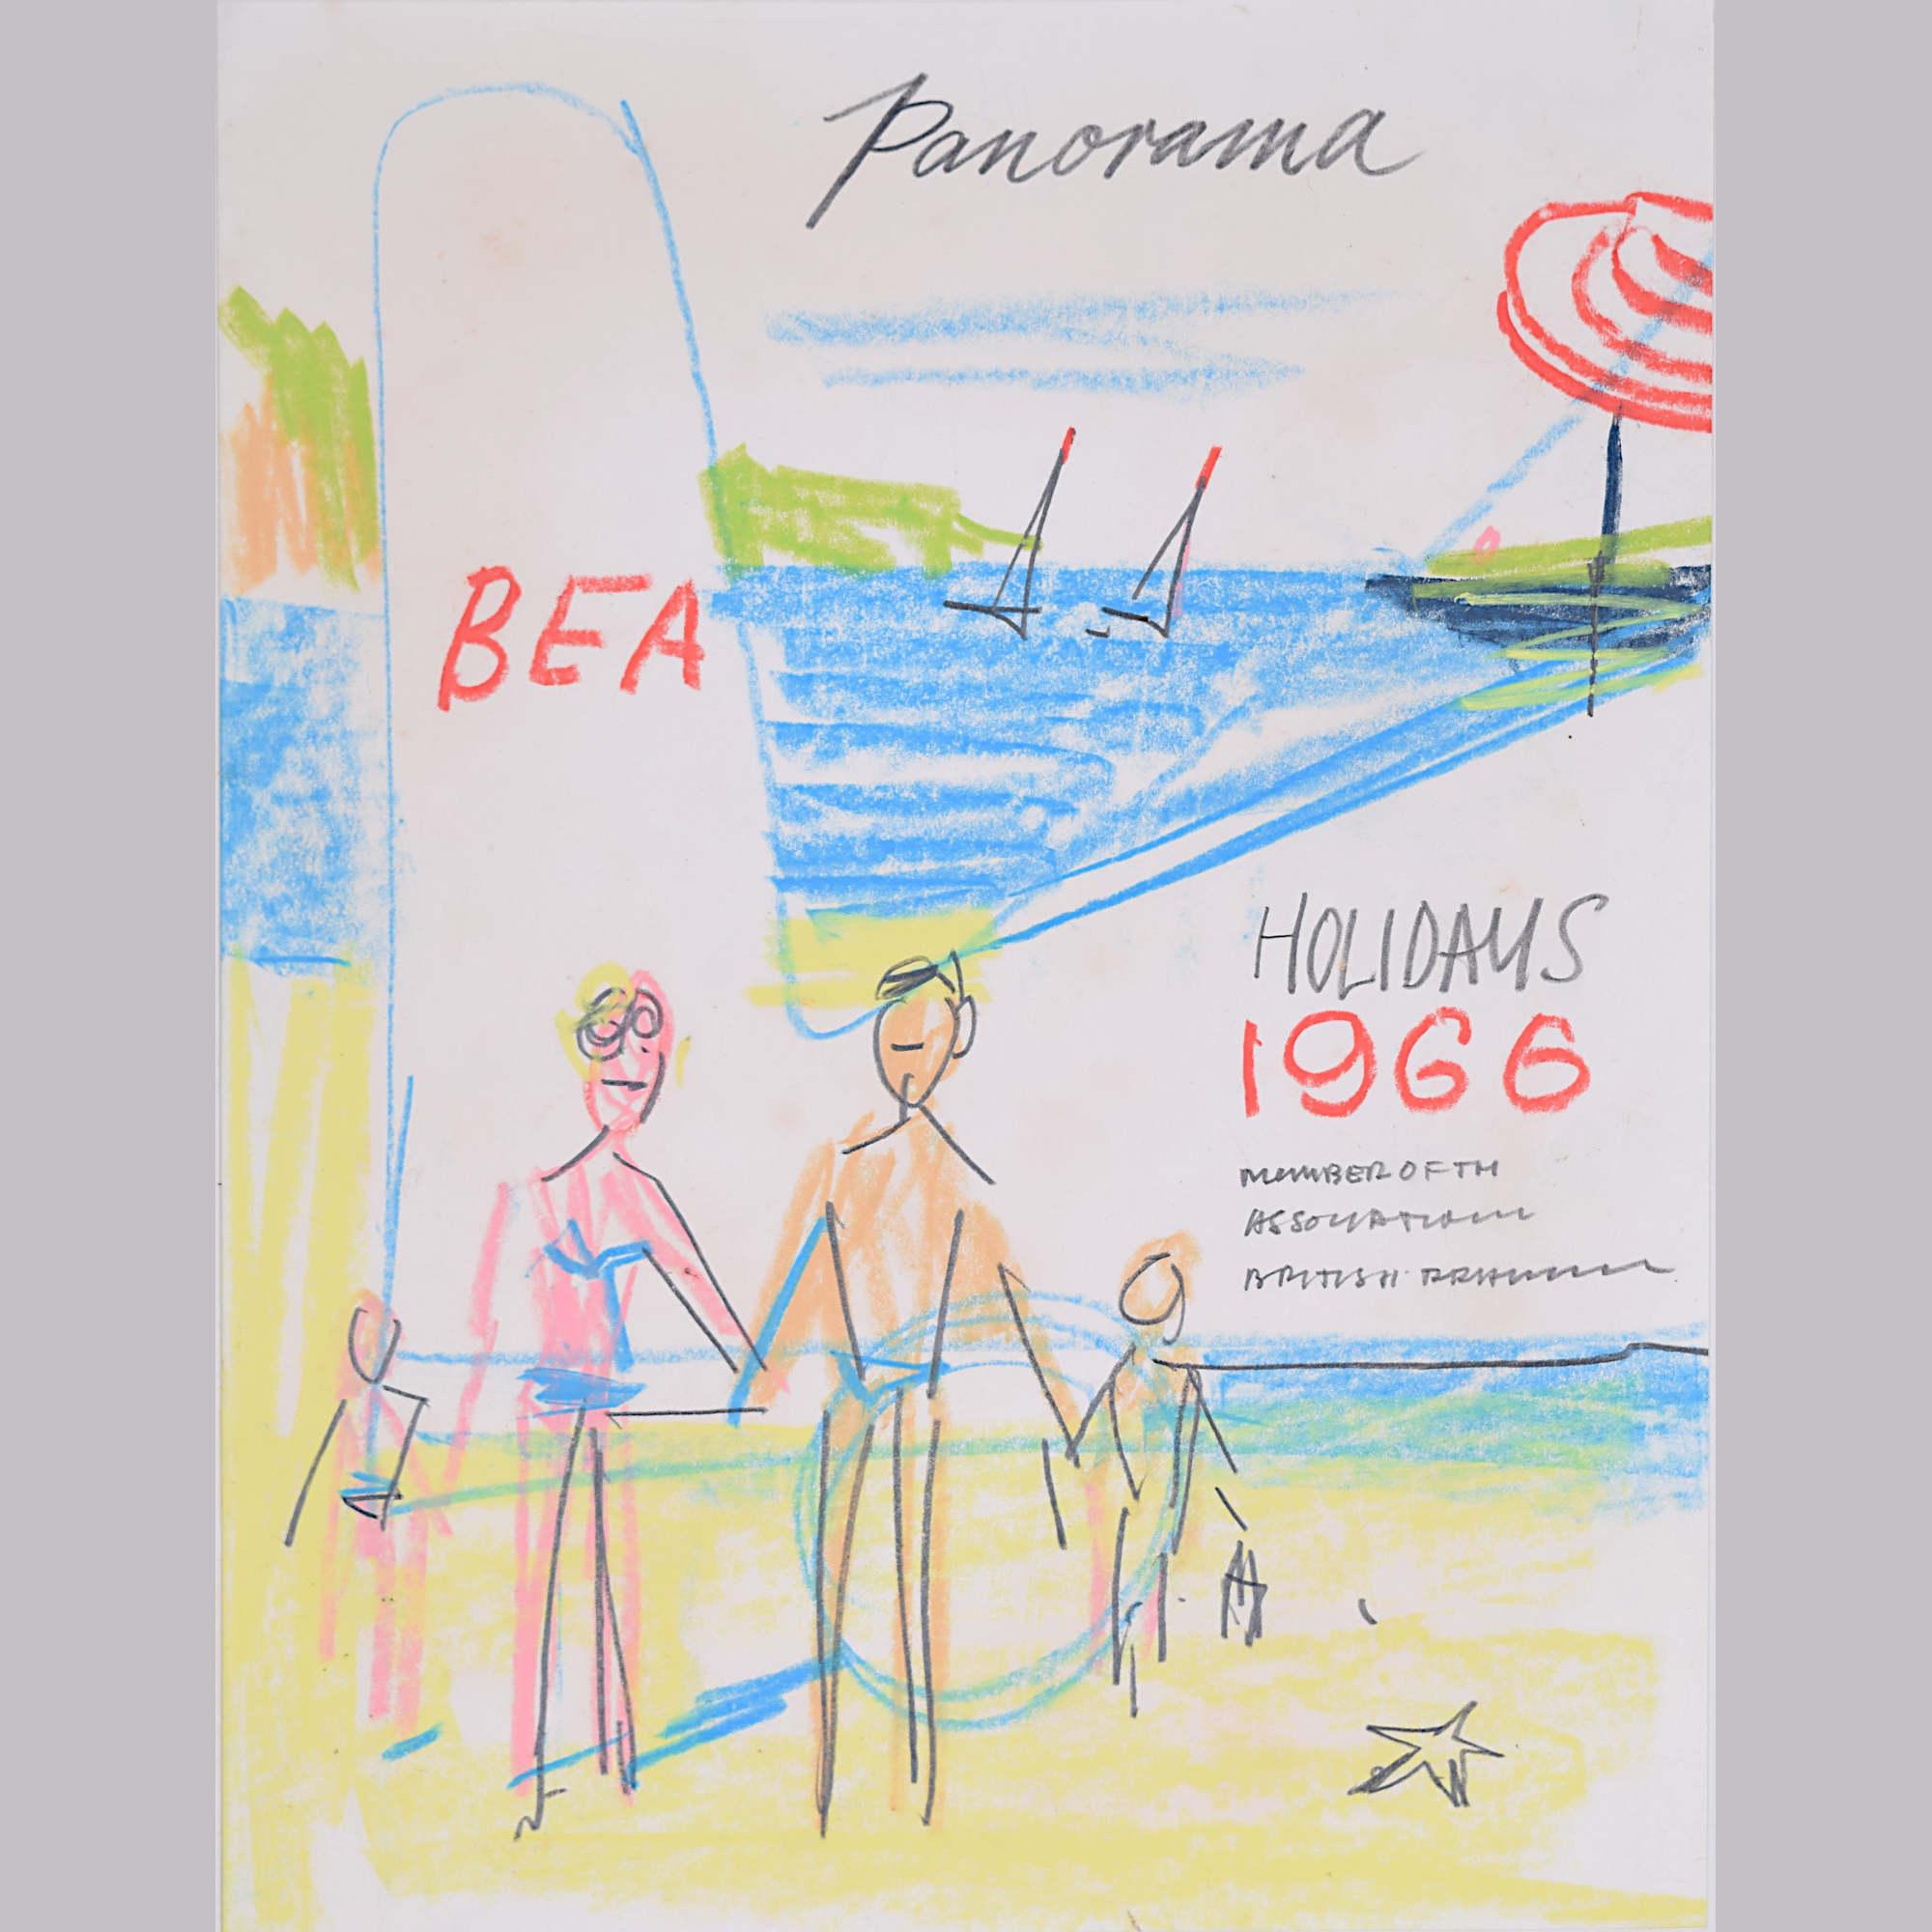 Peter Collins ARCA original design for Panorama Holiday Brochure 1966